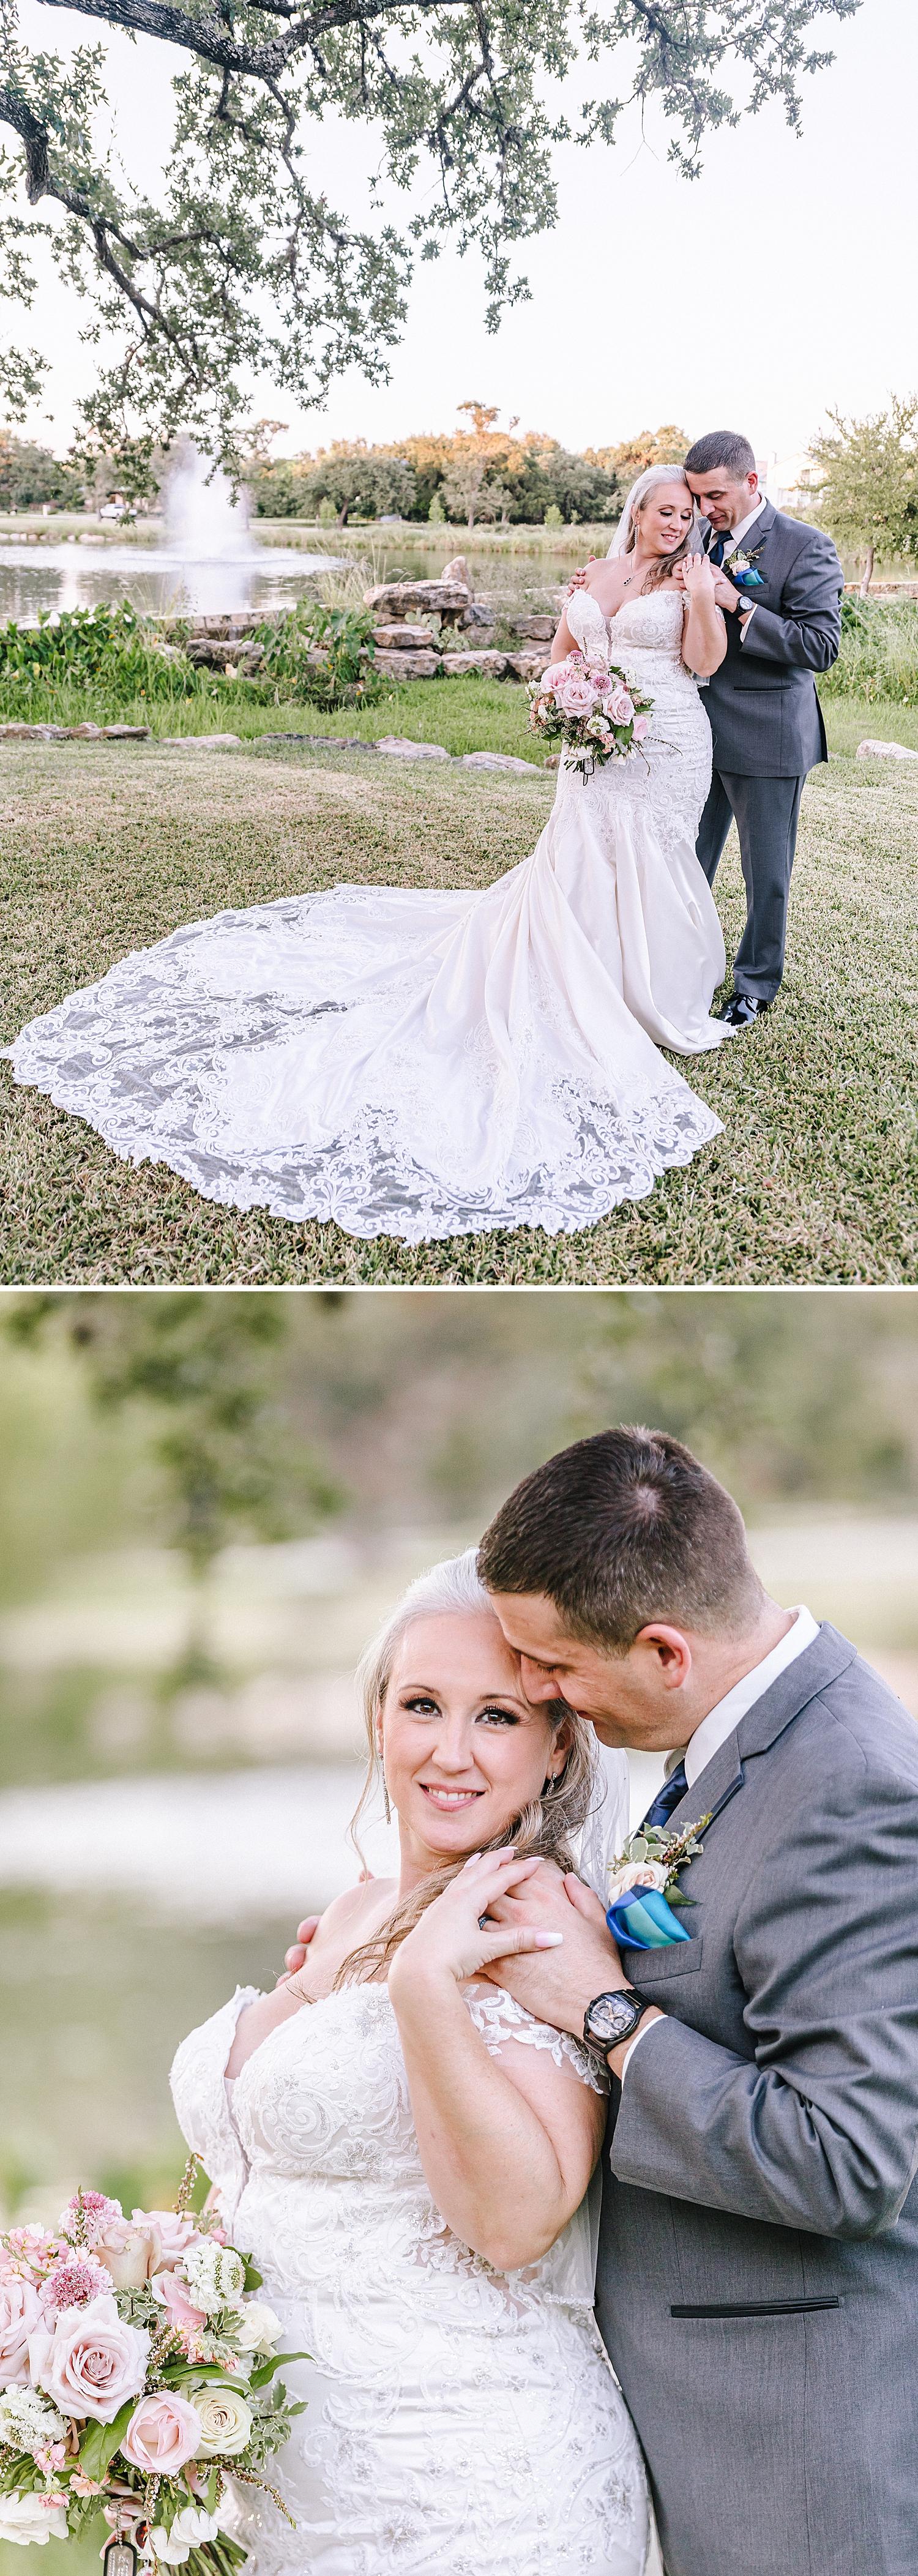 The-Club-at-Garden-Ridge-Military-Wedding-Carly-Barton-Photography_0047.jpg